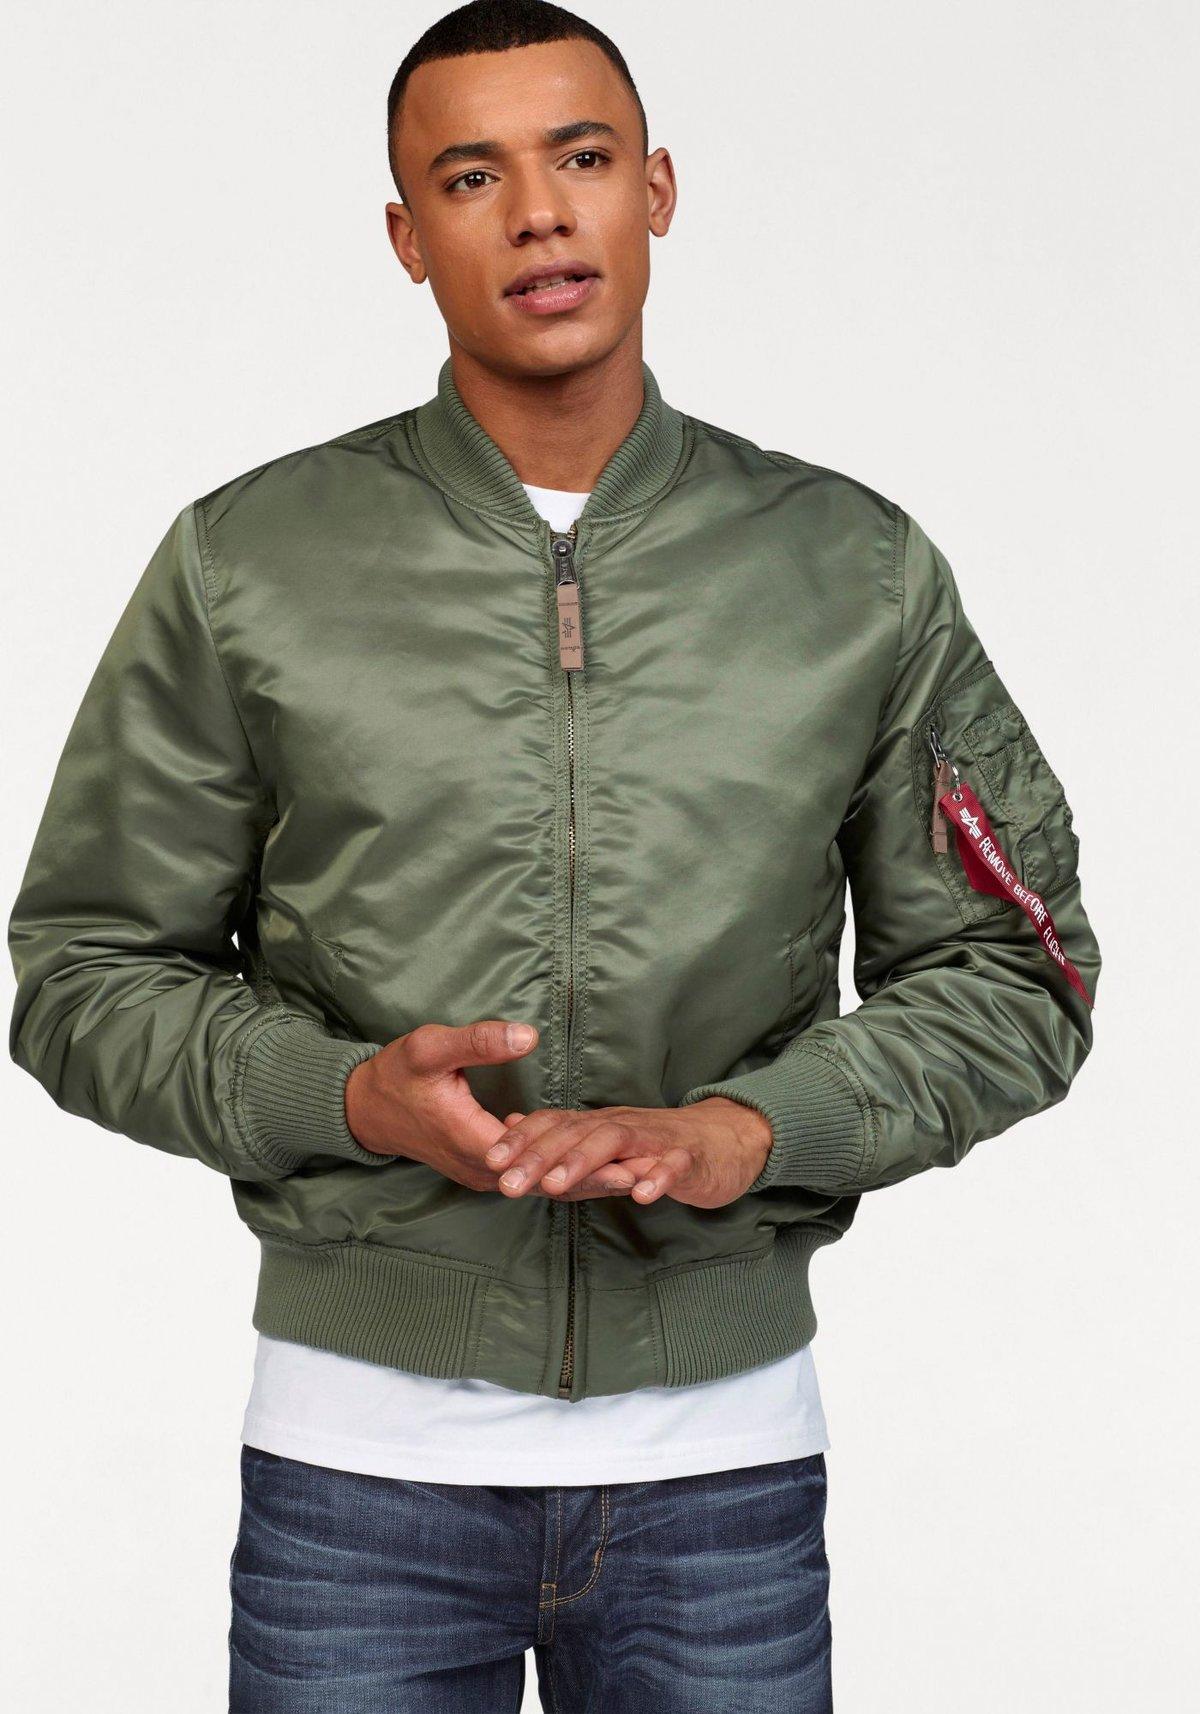 A k fashion apparel industries